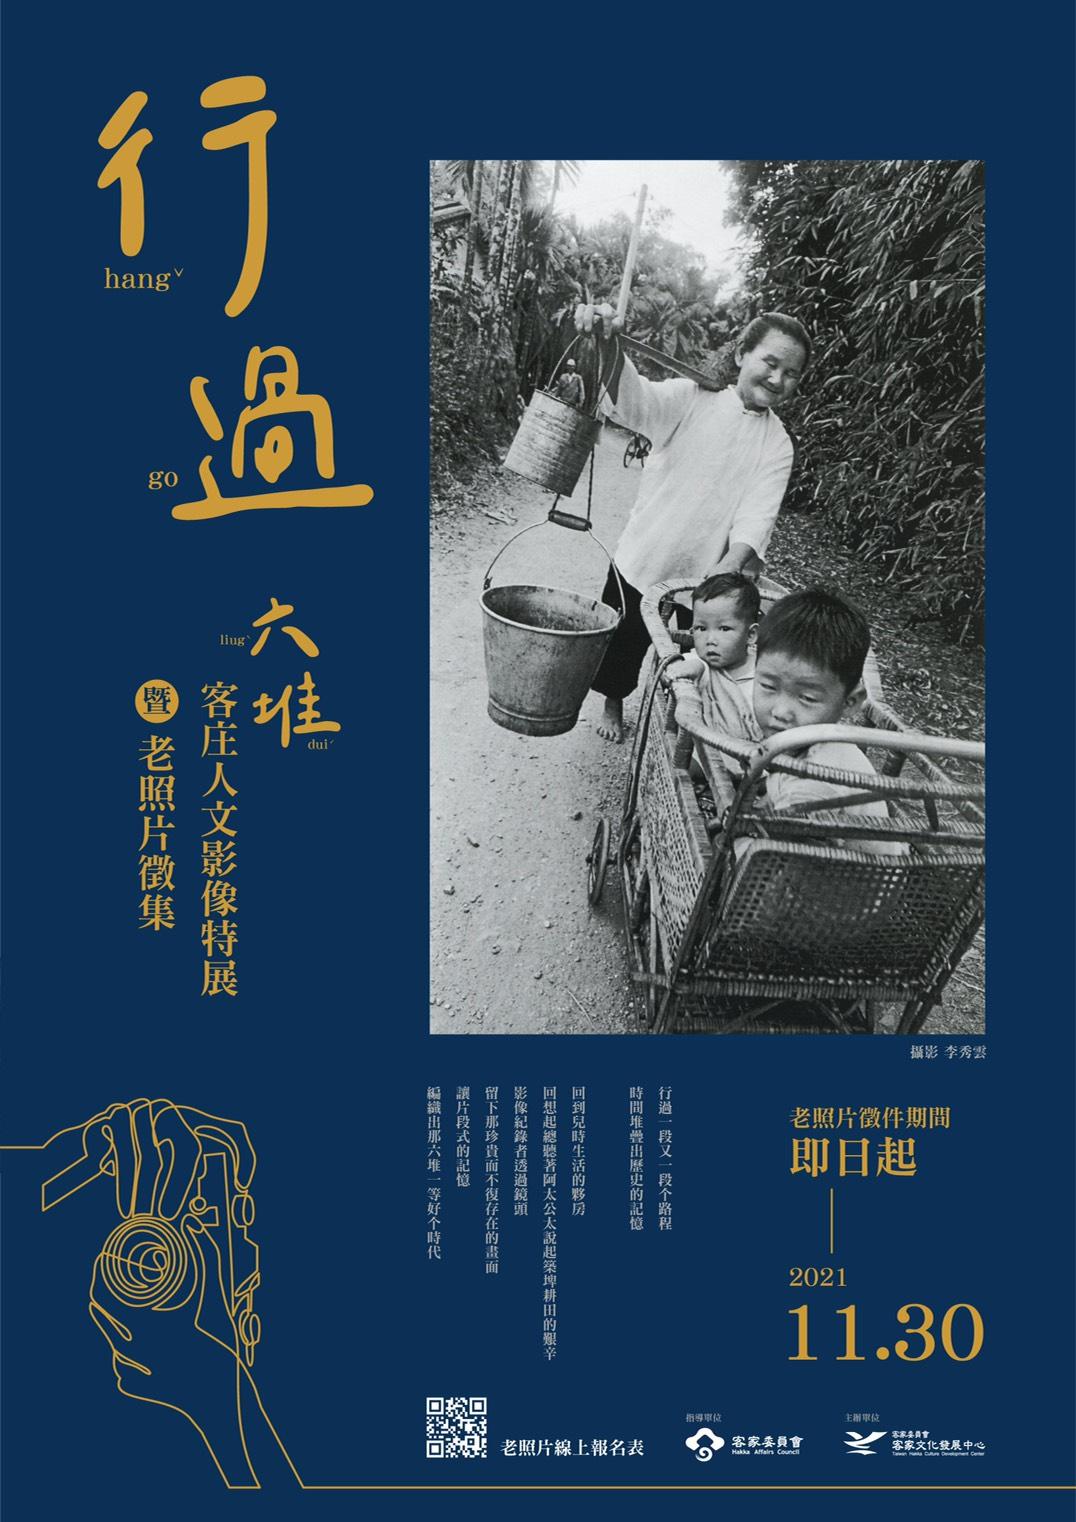 Read more about the article 六堆老照片徵集開跑 保存歷史記憶影像